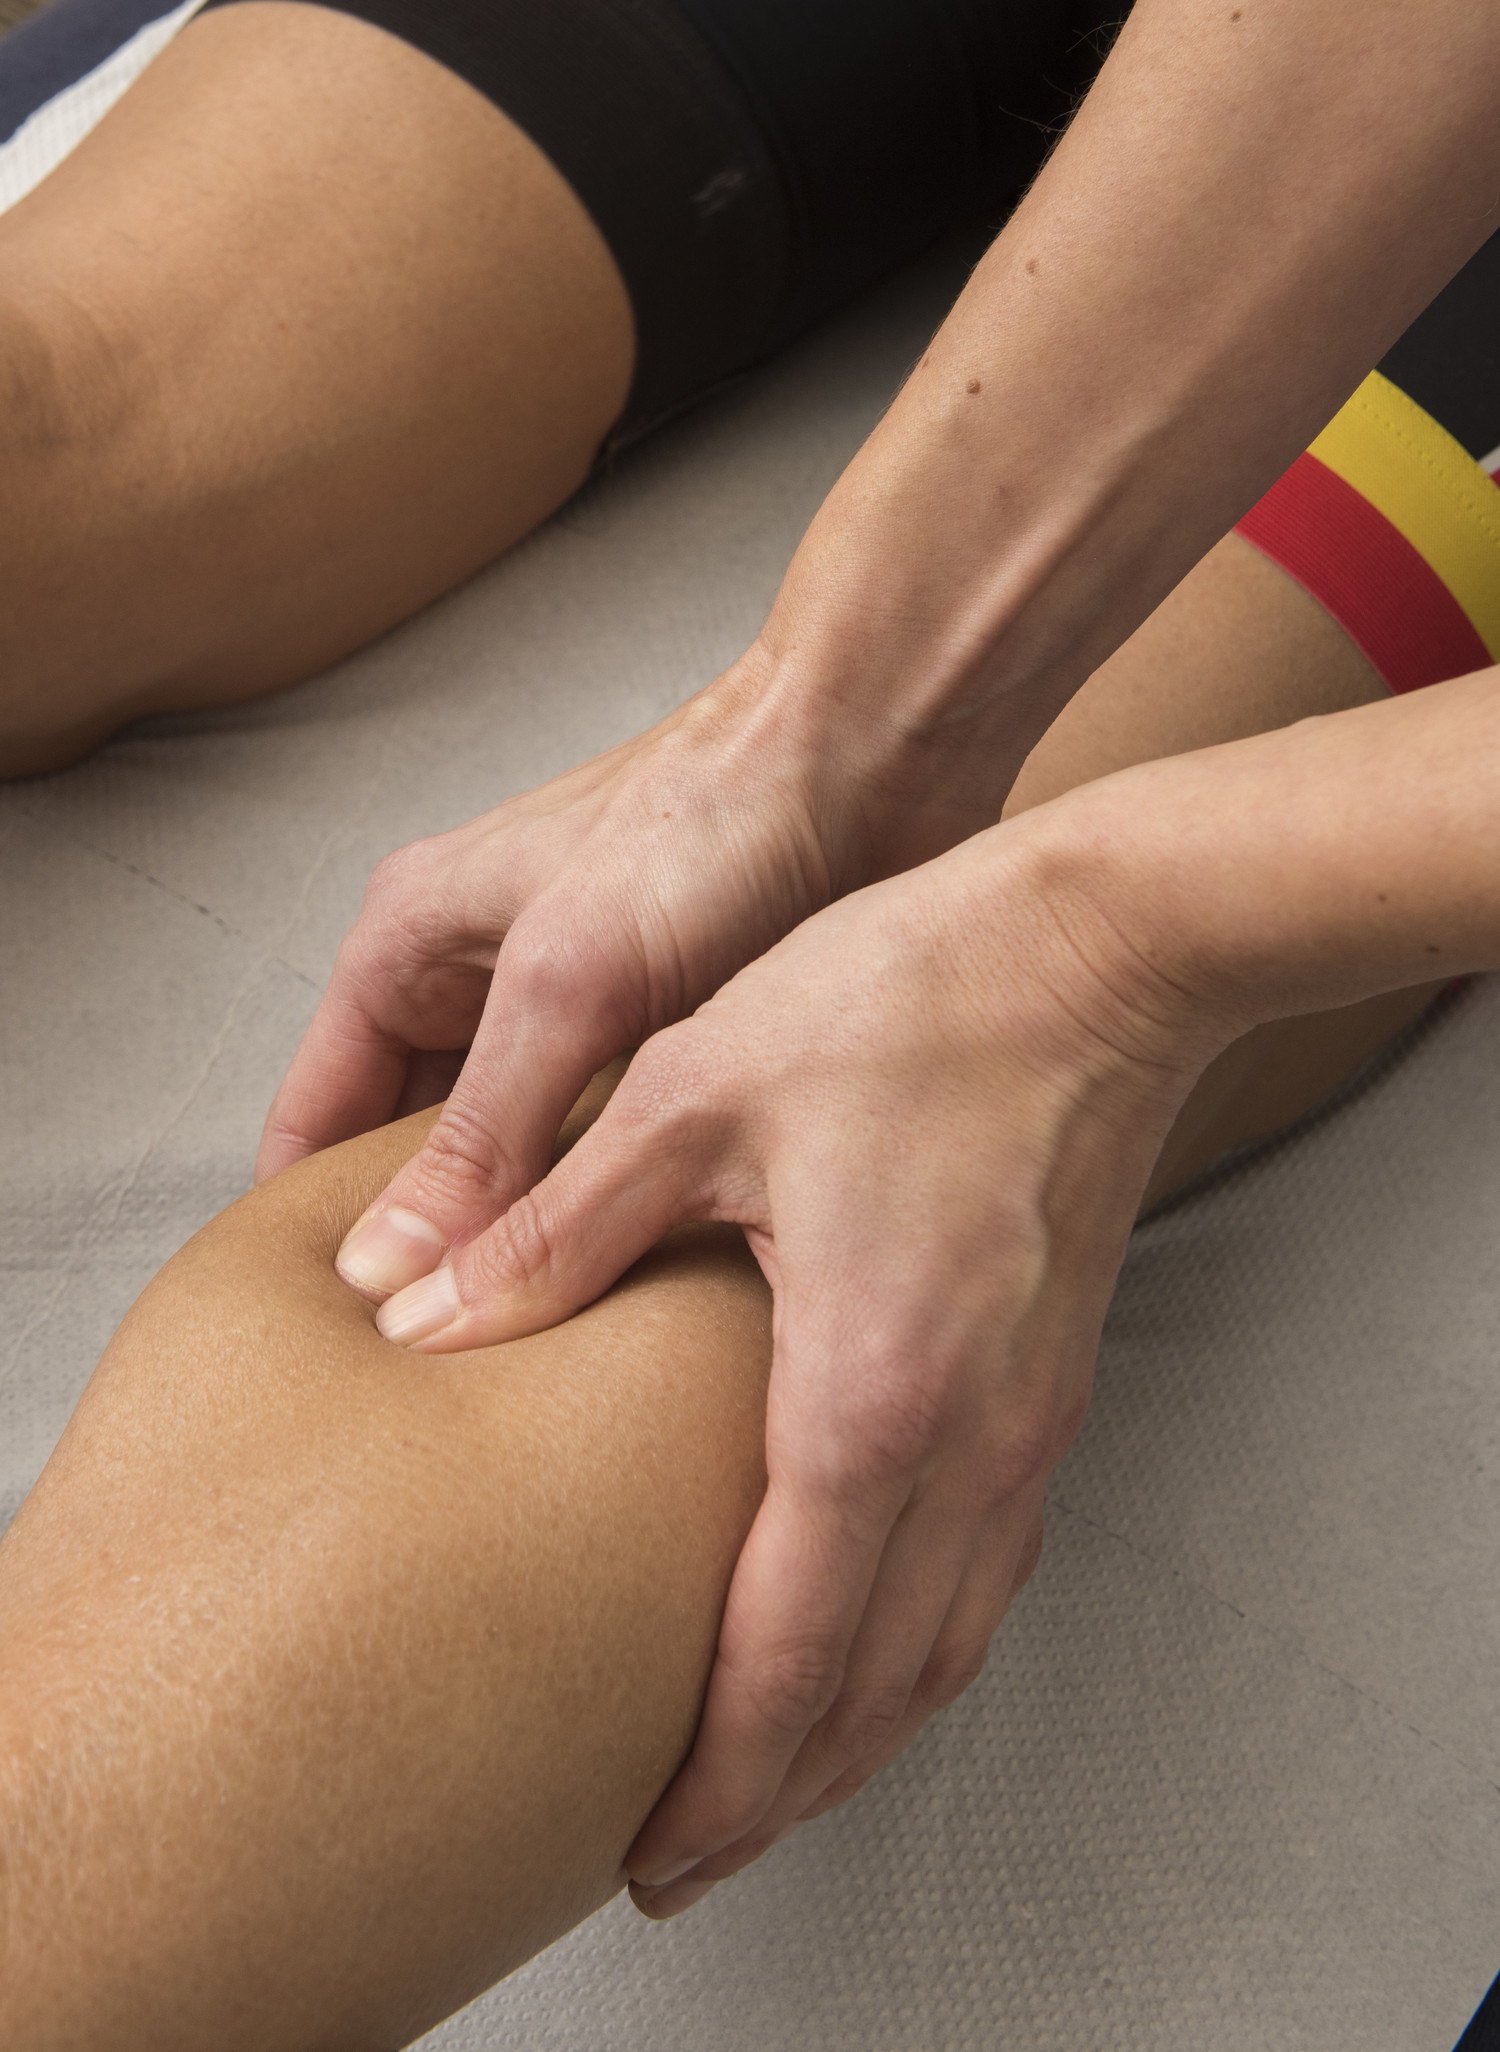 Soft tissue techniques